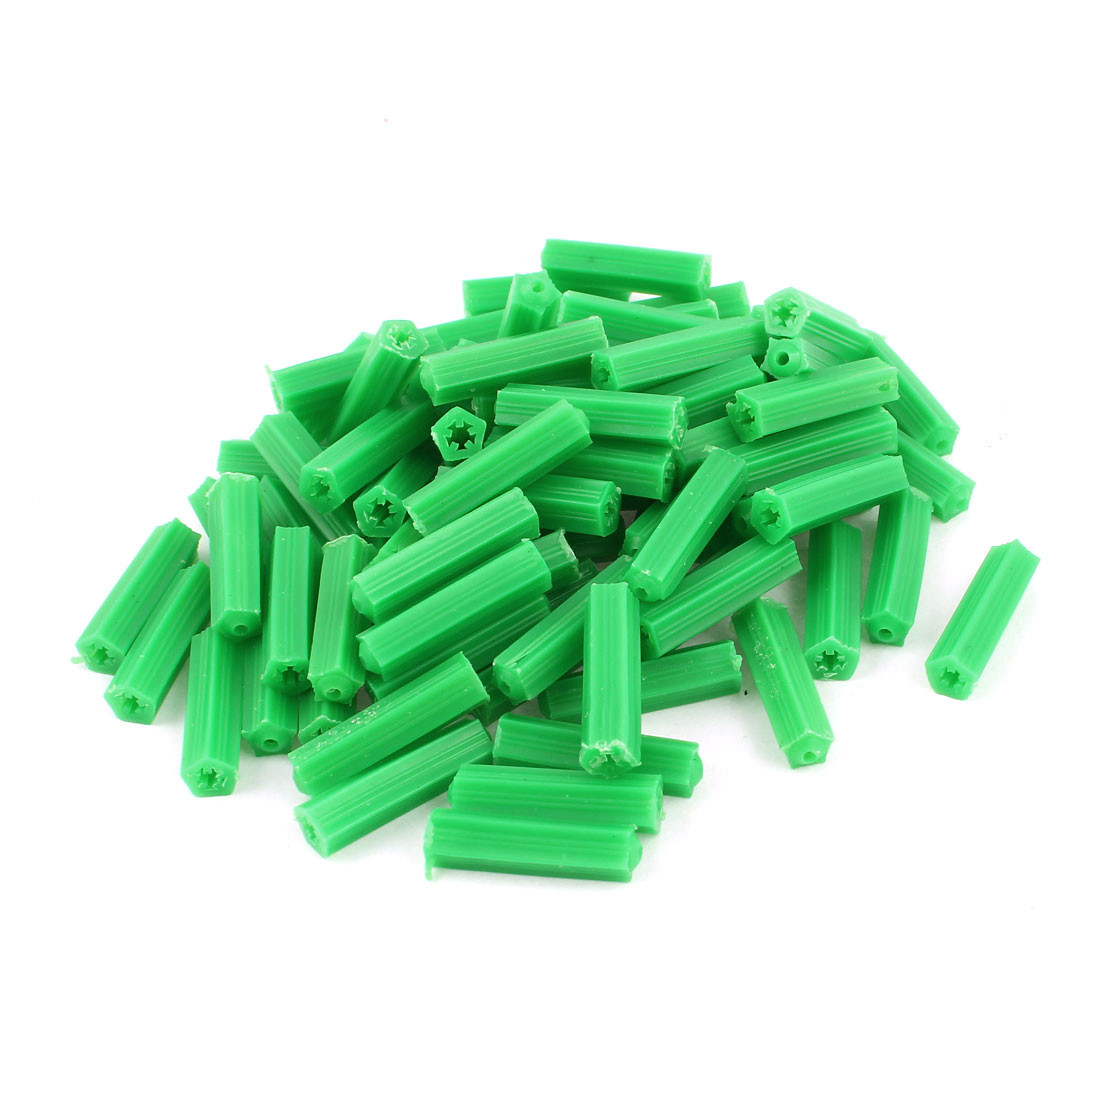 85 Pcs Green Plastic Masonry Screw Fixing Wall Anchor 8mm x 23mm